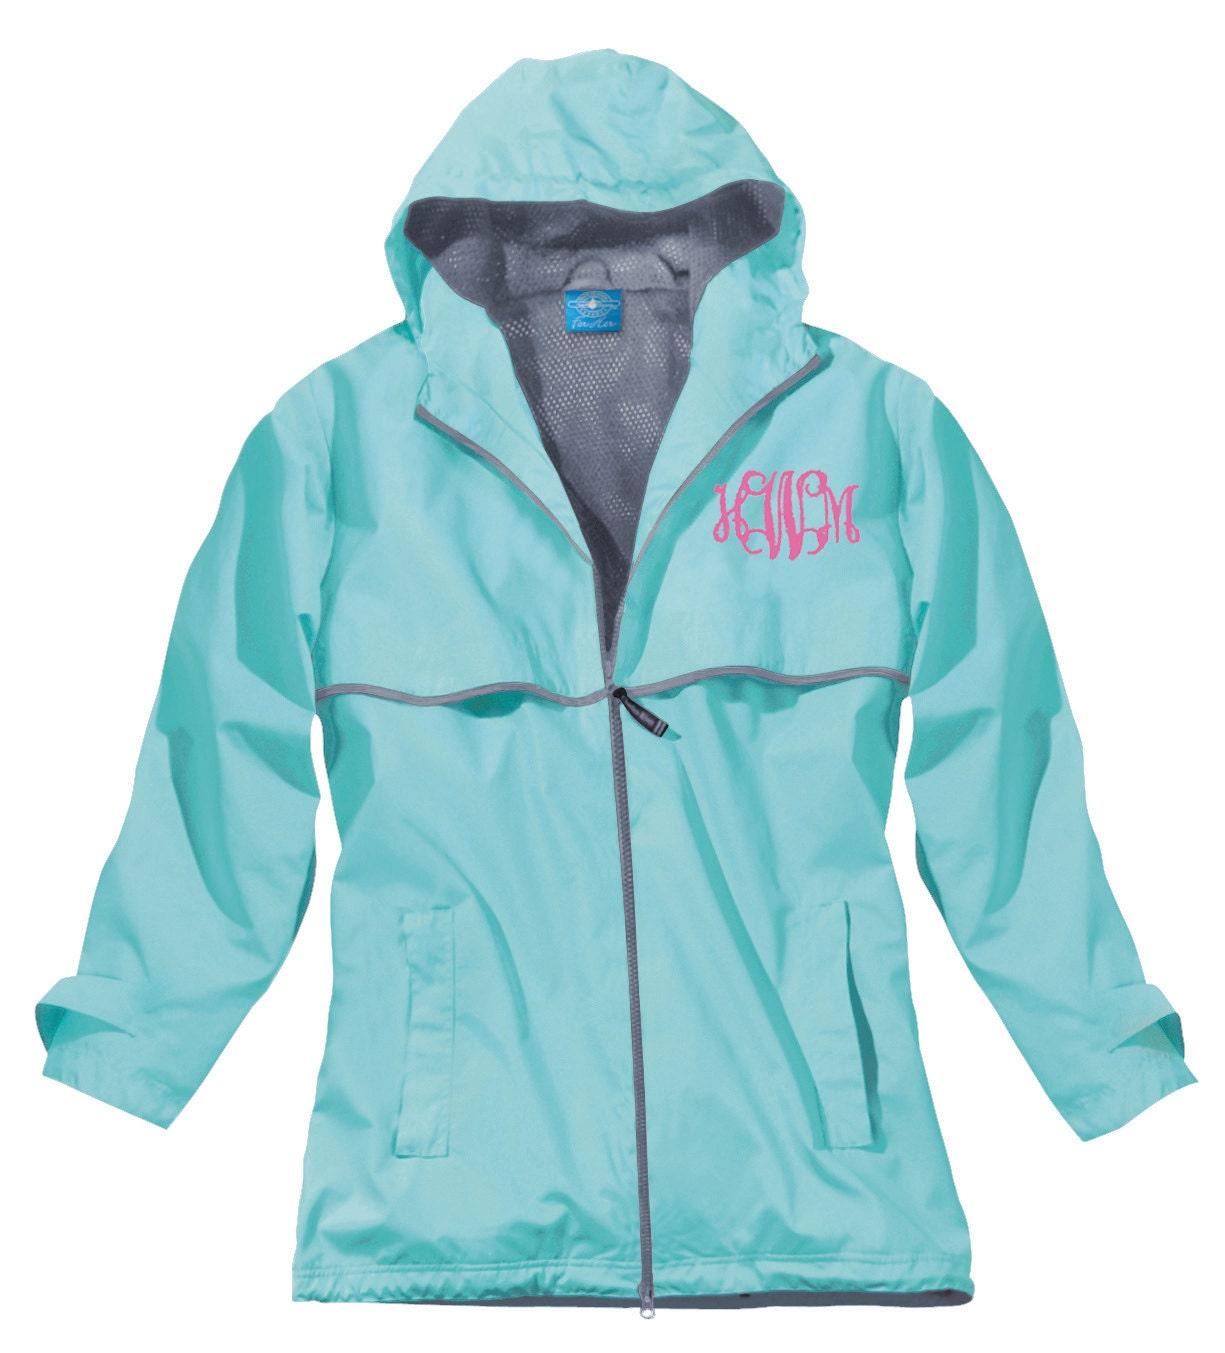 free shipping monogrammed charles river rain jacket